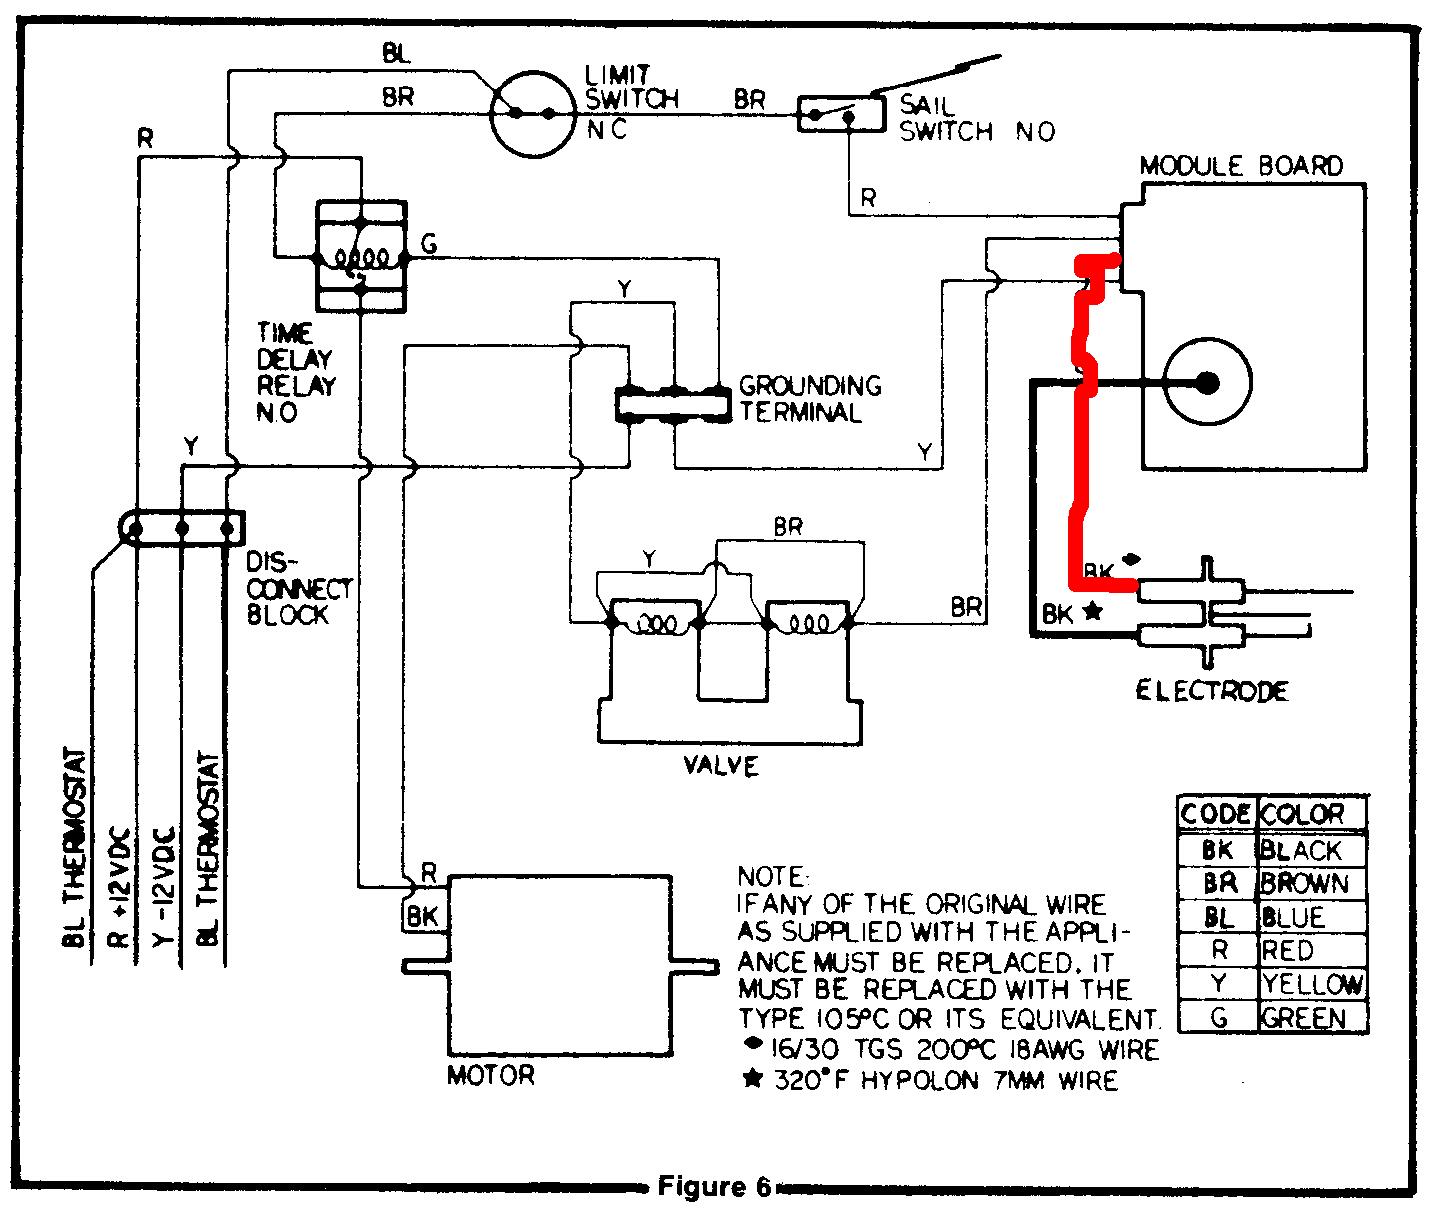 Wiring Diagram York Gas Furnace I Have | Manual E-Books - Gas Furnace Wiring Diagram